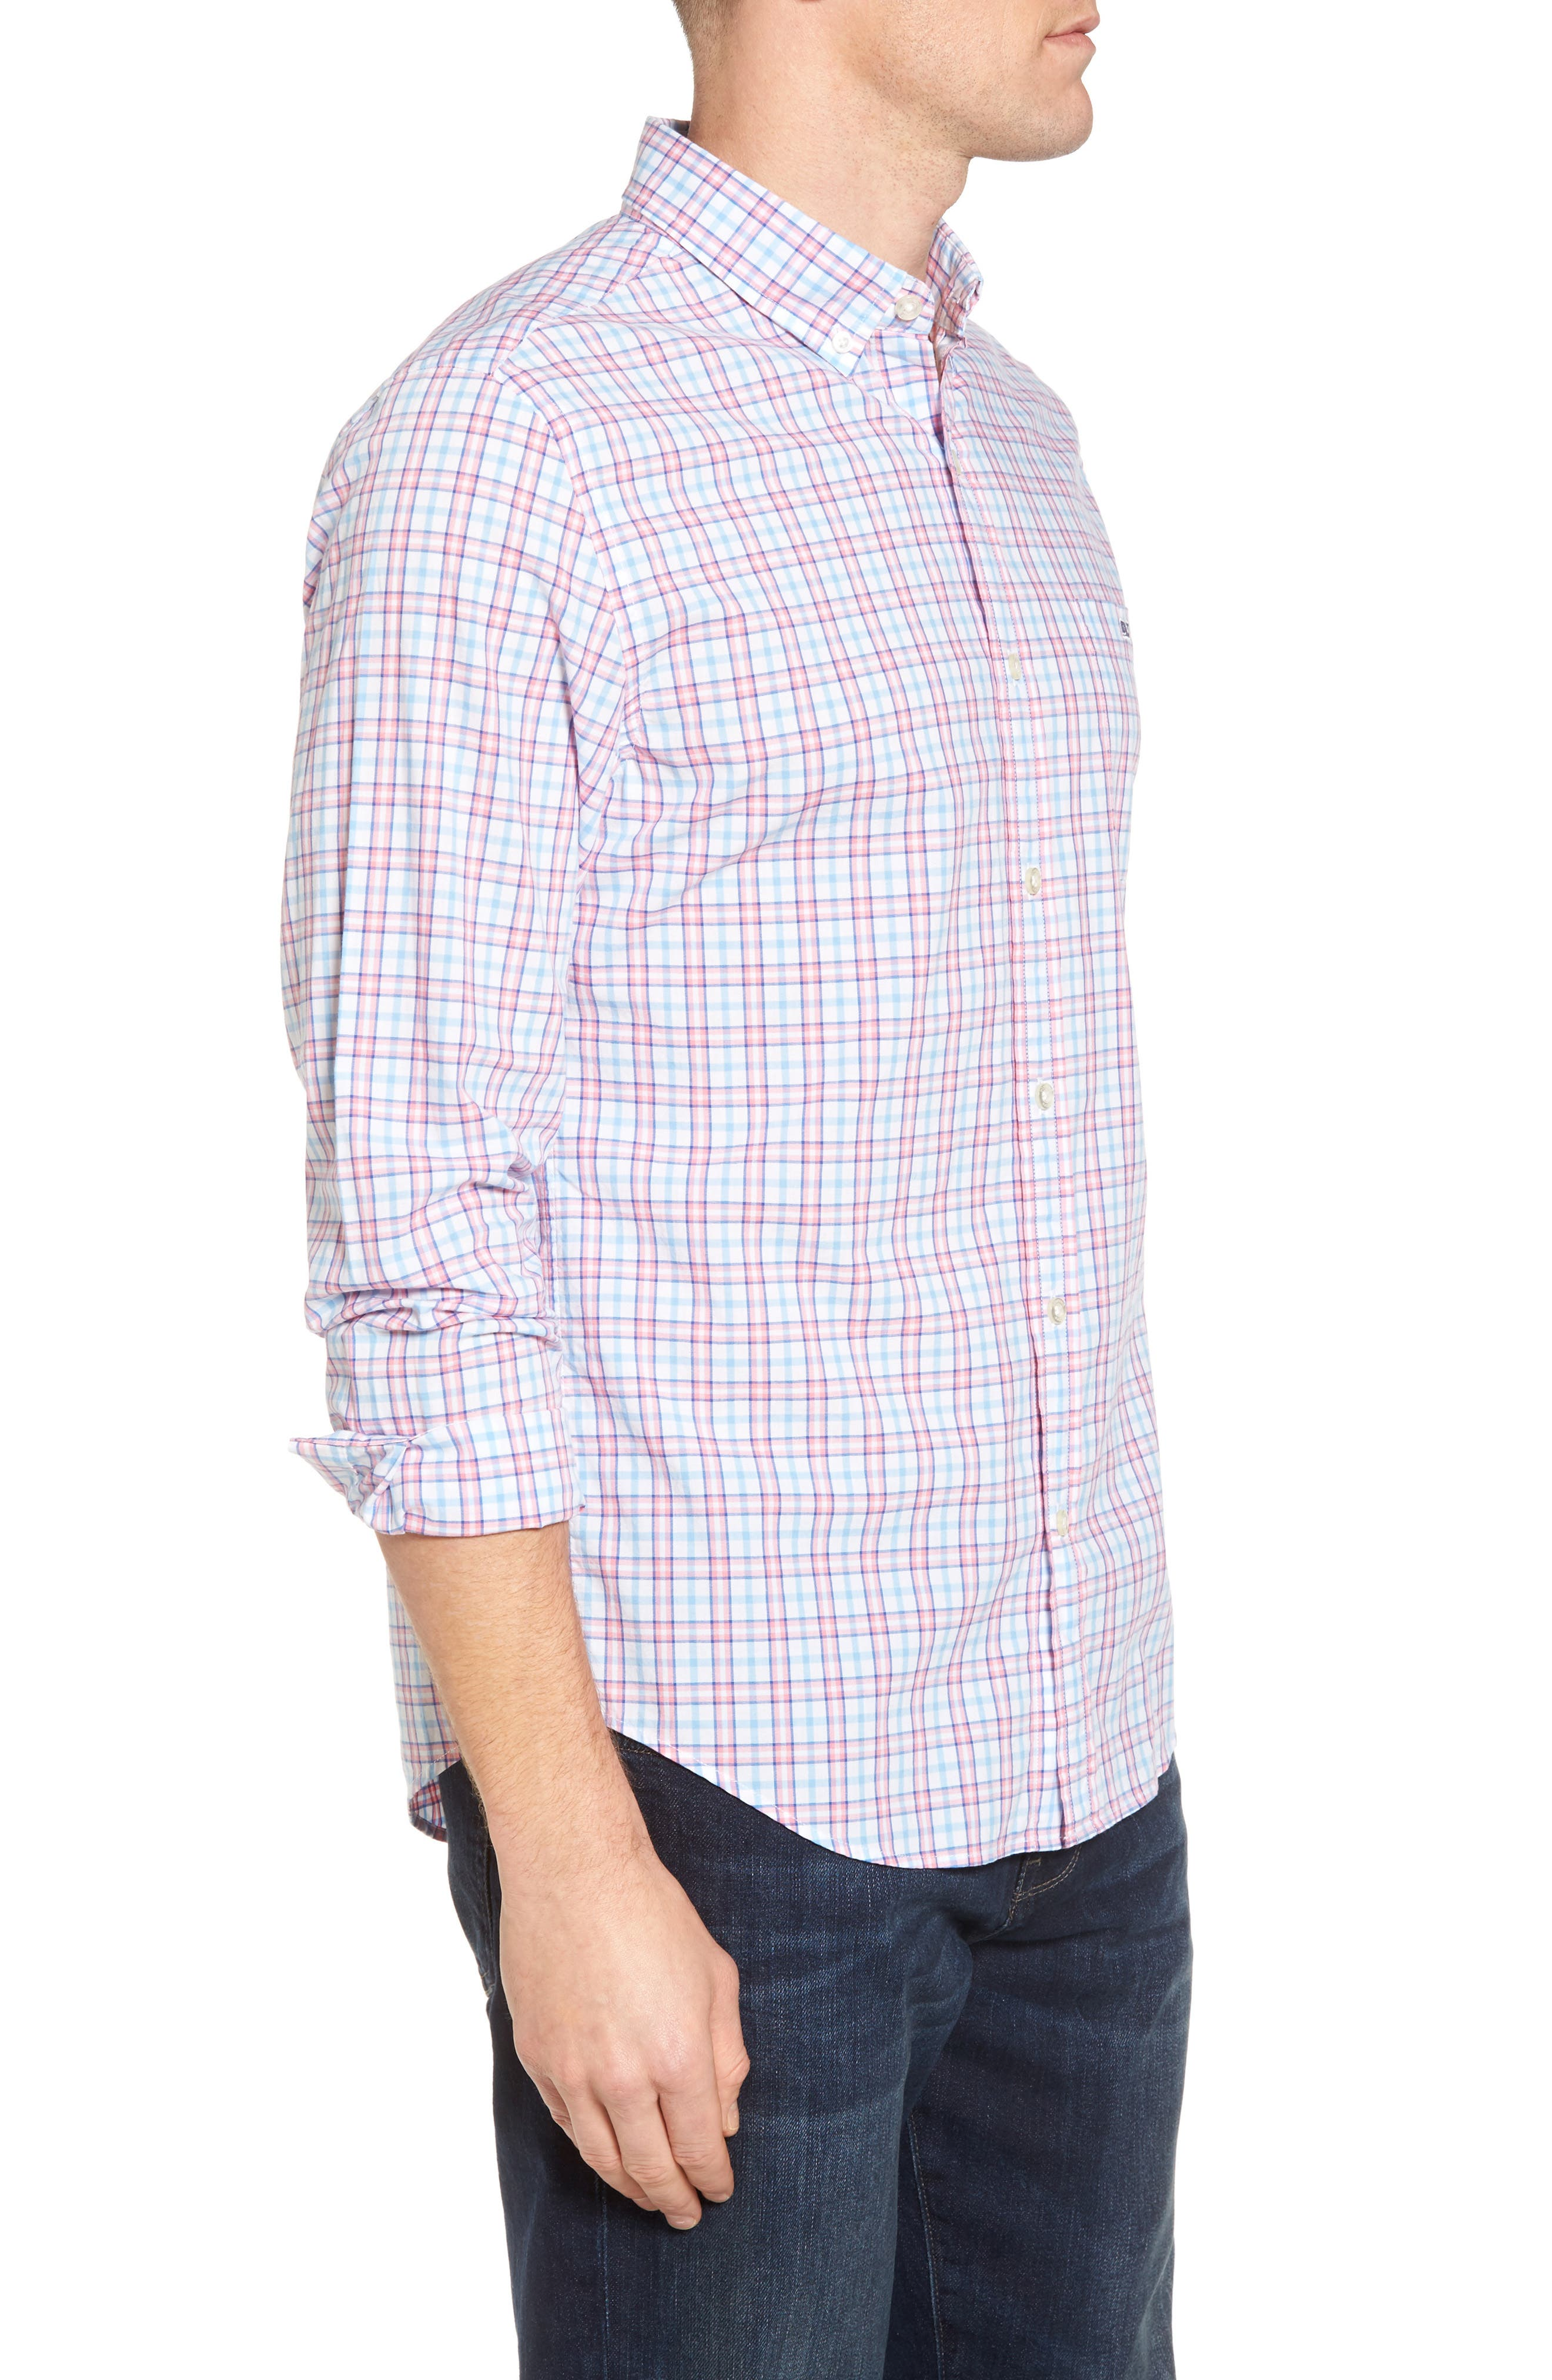 Kennard Tucker Slim Fit Plaid Sport Shirt,                             Alternate thumbnail 3, color,                             956